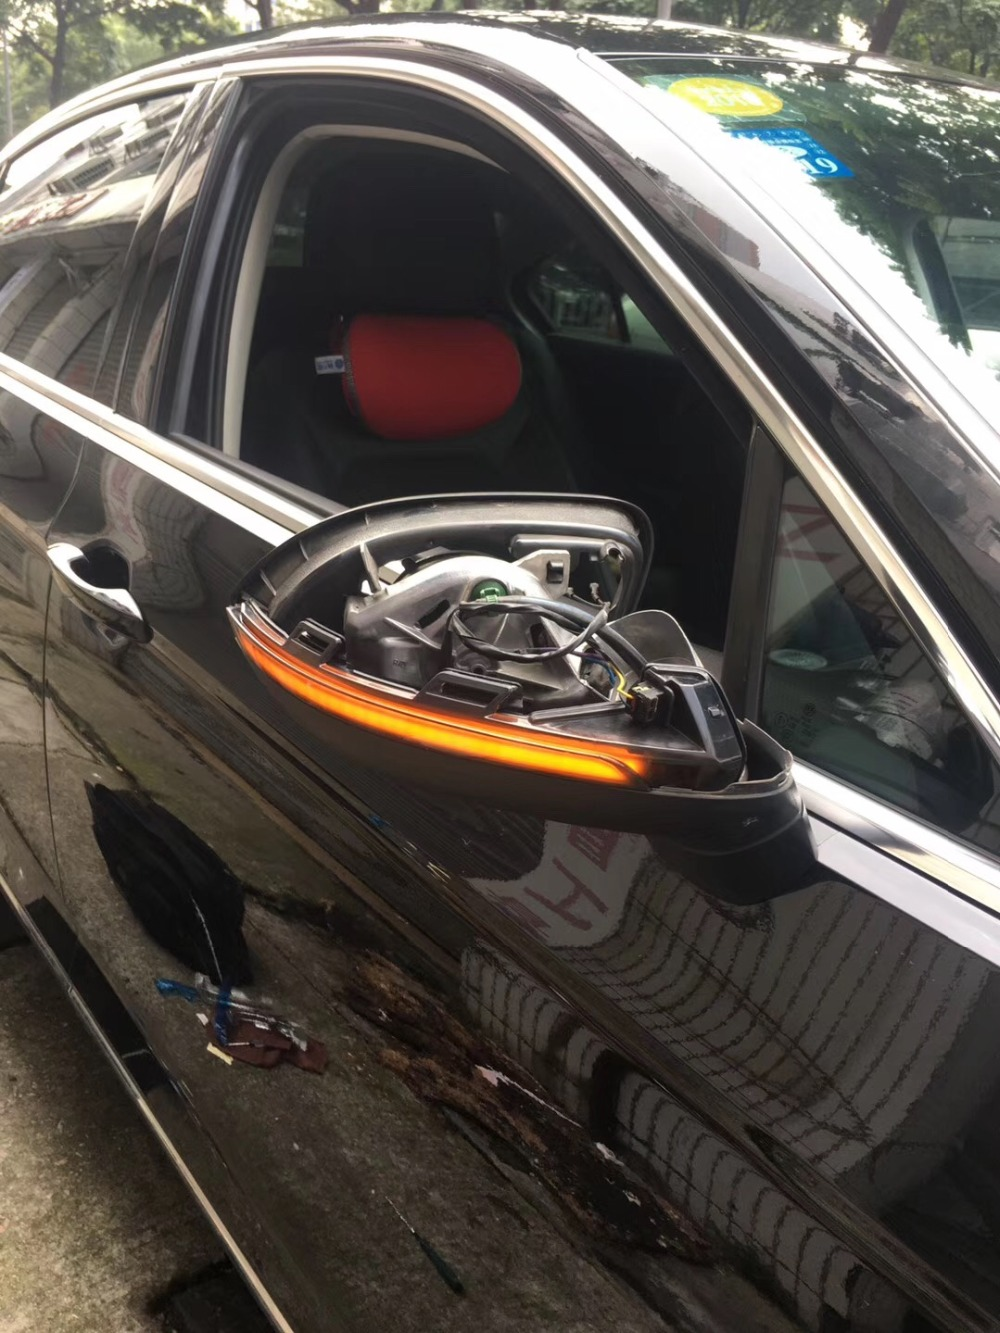 AIDUAUTO FOR VW Passat B8 Variant Arteon Dynamic Blinker LED Turn Signal Light Mirror Indicator Sequential 2016 2017 2018 2019